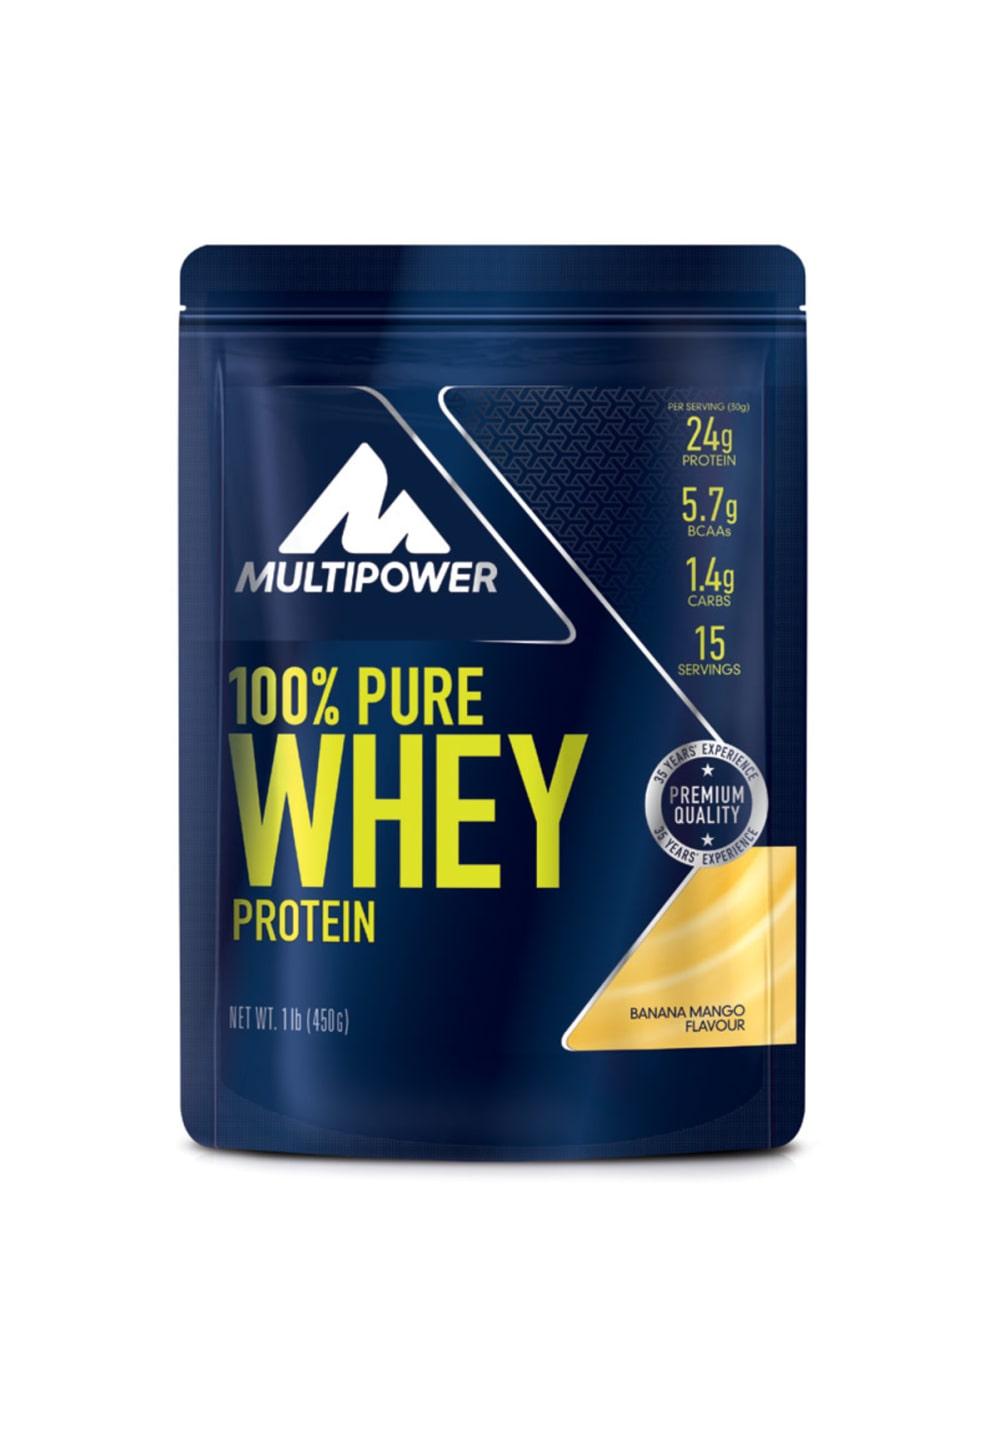 Multipower 100 % Pure Whey Banana Mango 450g Sporternaehrung Unisex unisize, Gr.